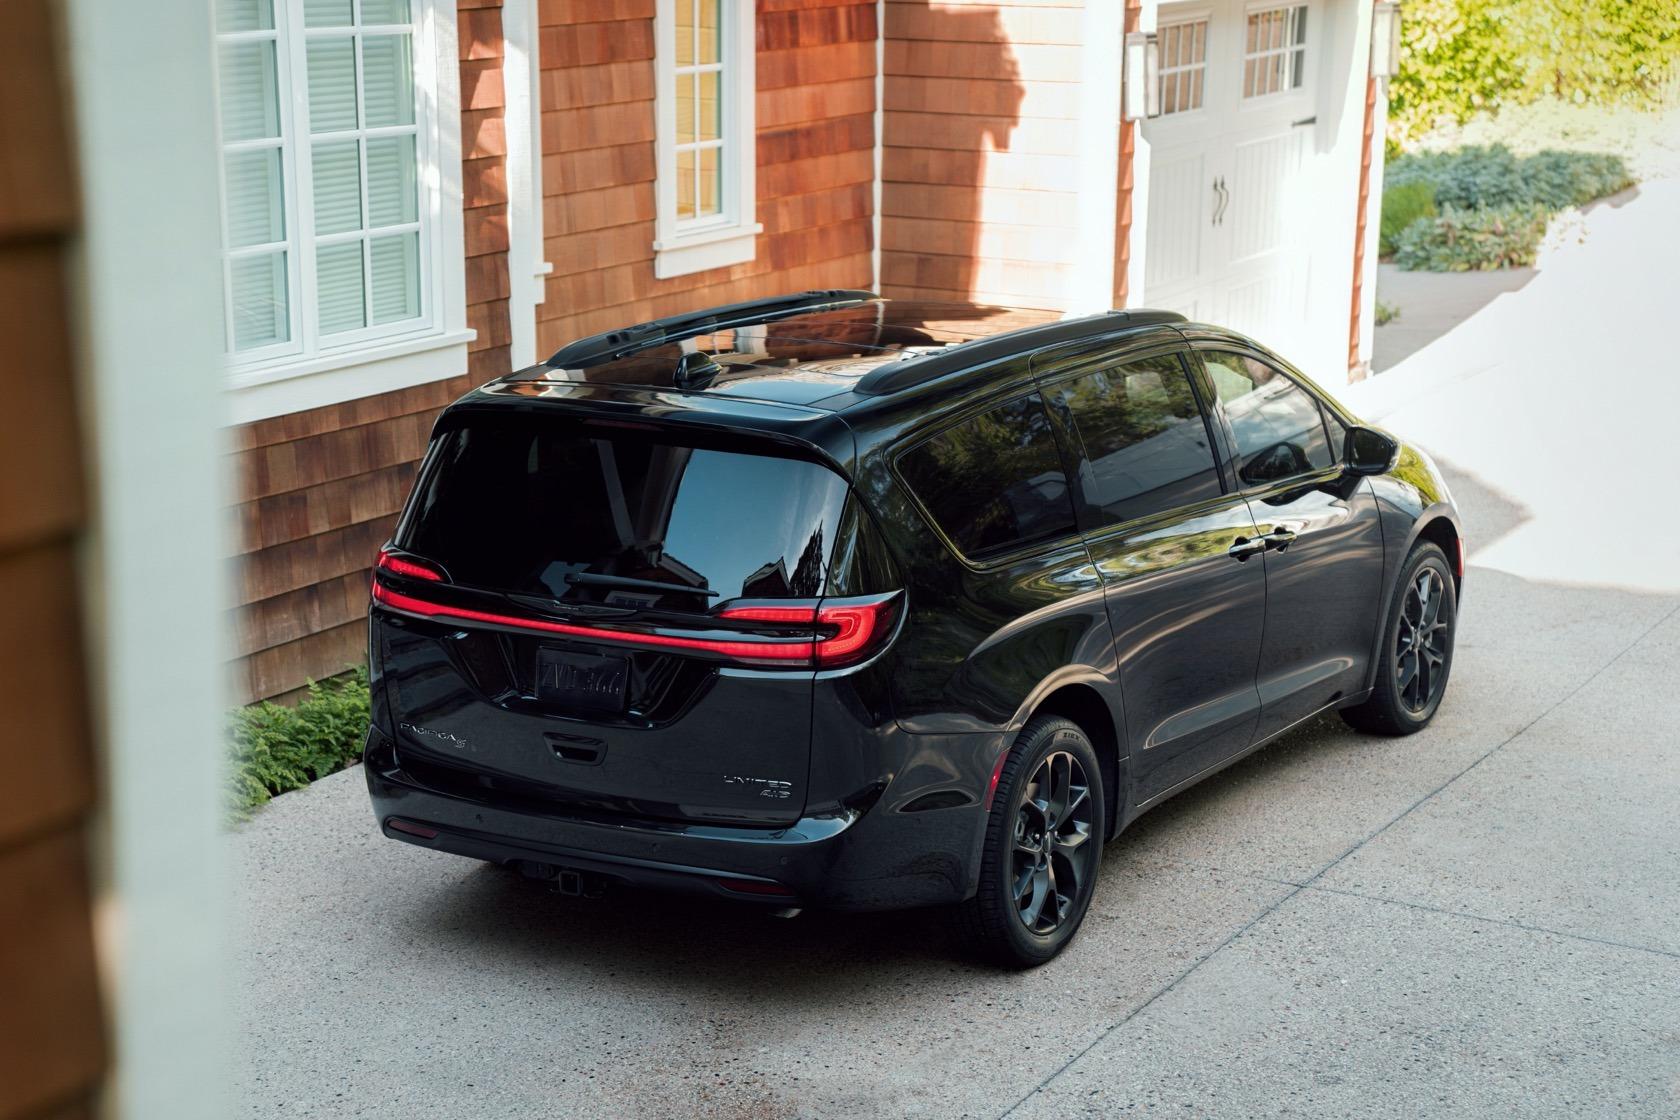 2022 Chrysler Lineup Price